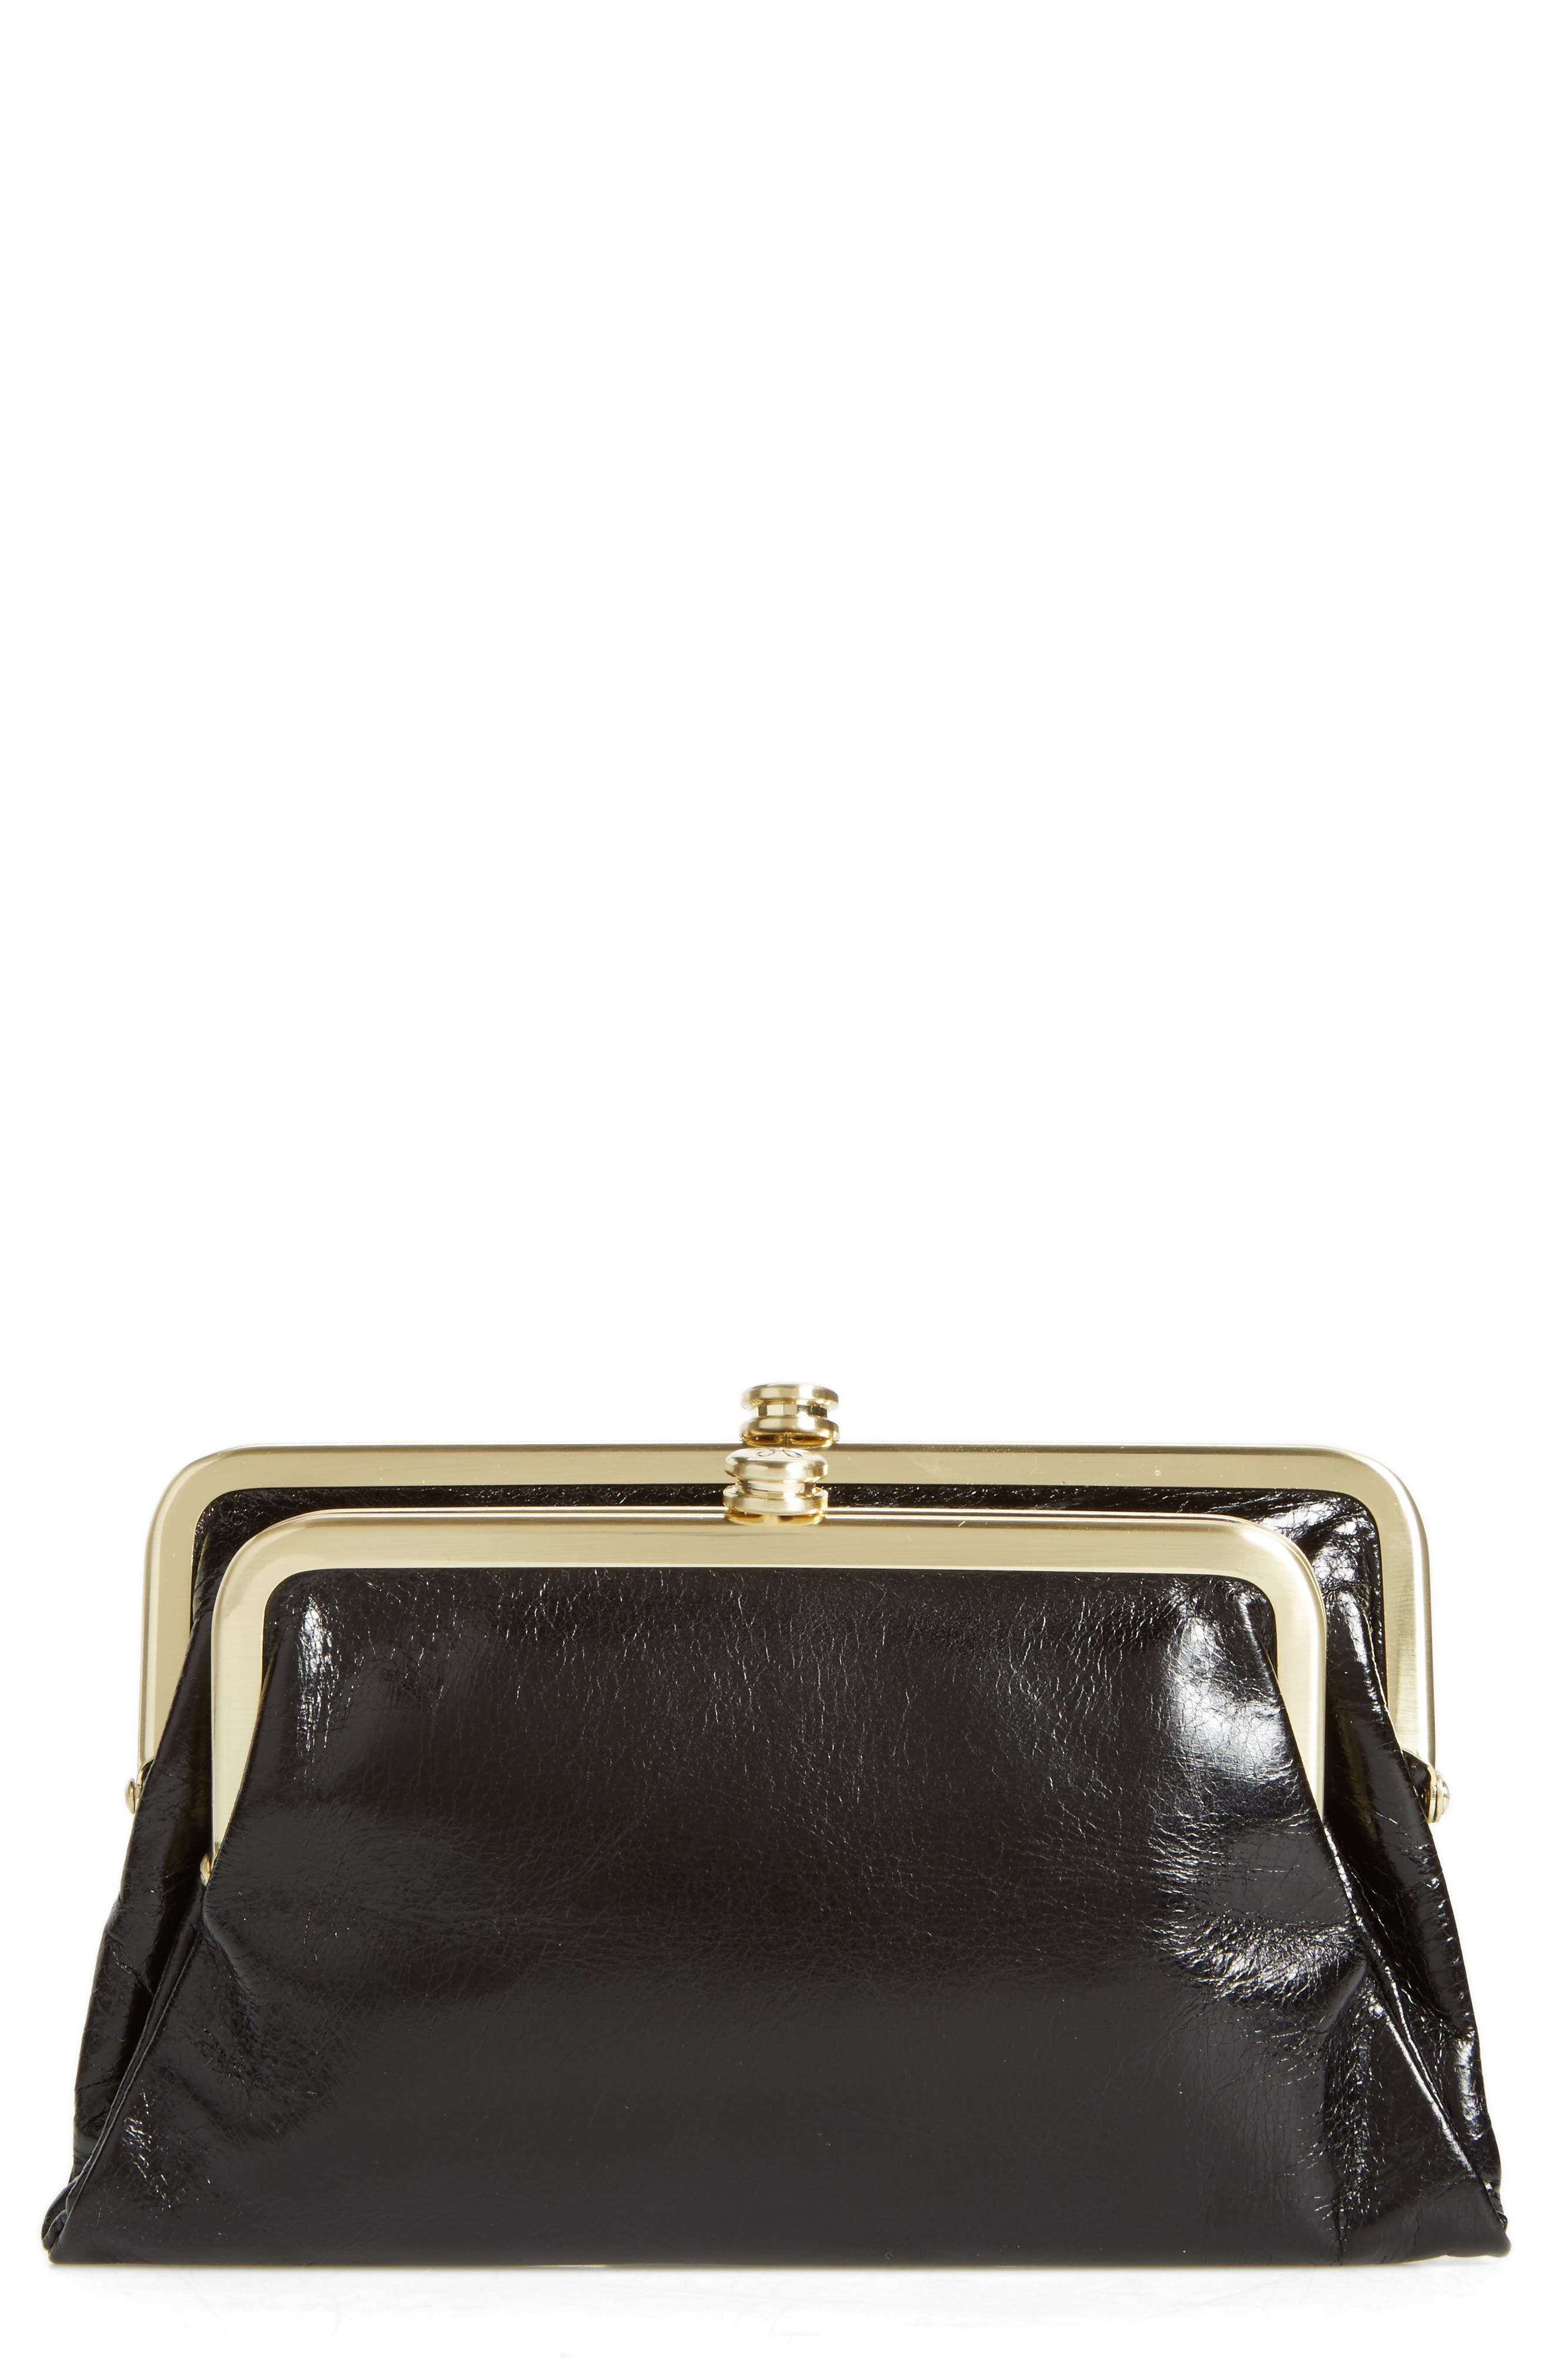 Hobo Suzette Calfskin Leather Wallet